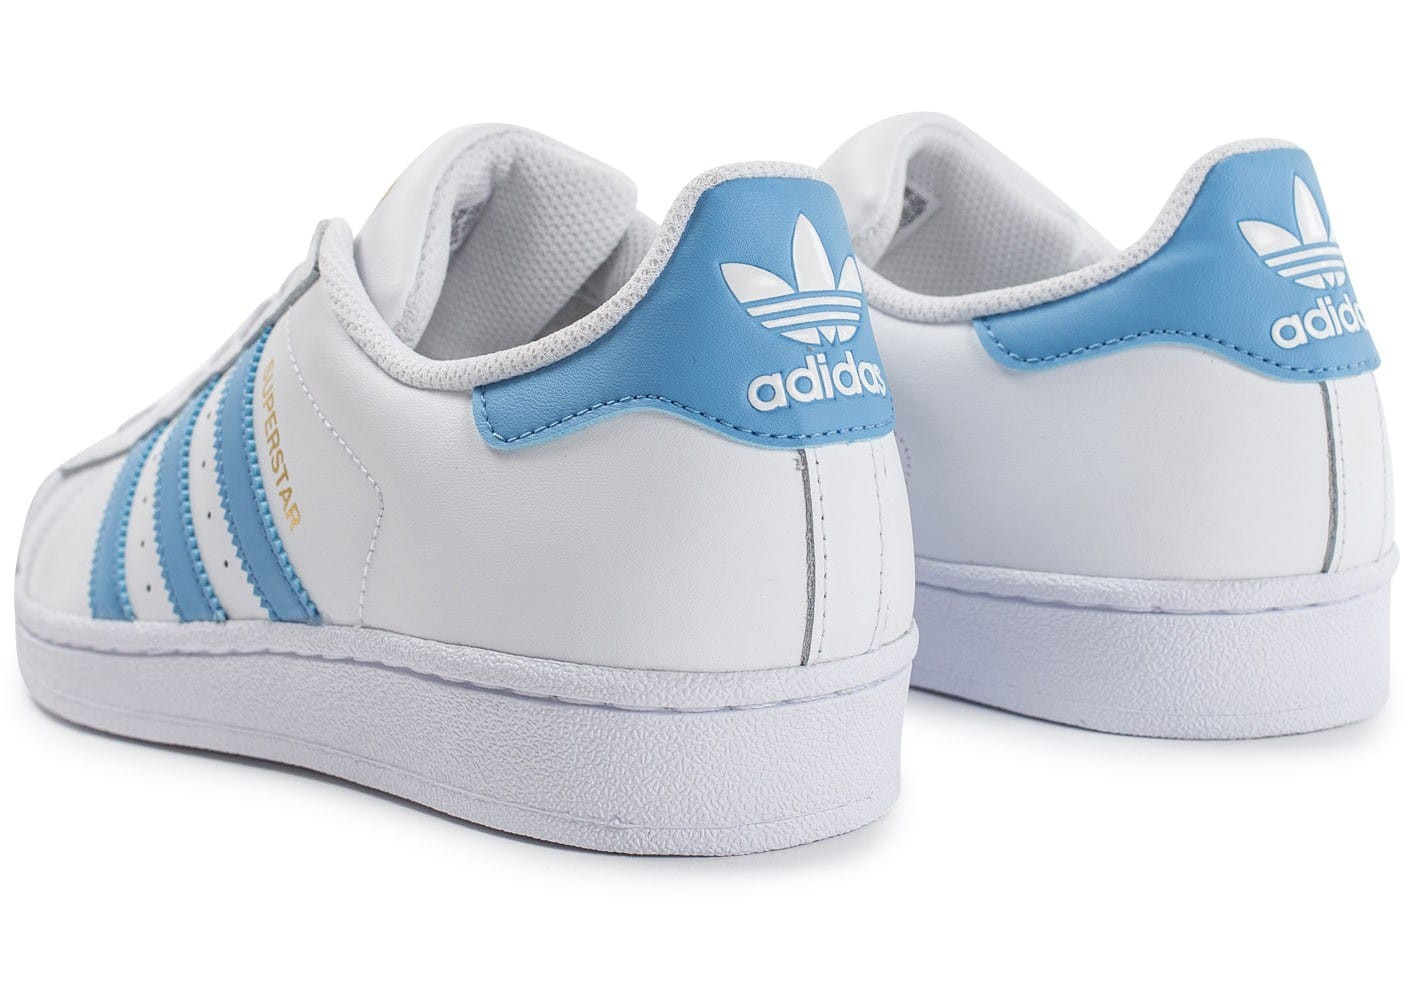 adidas superstar bleu ciel pas cher